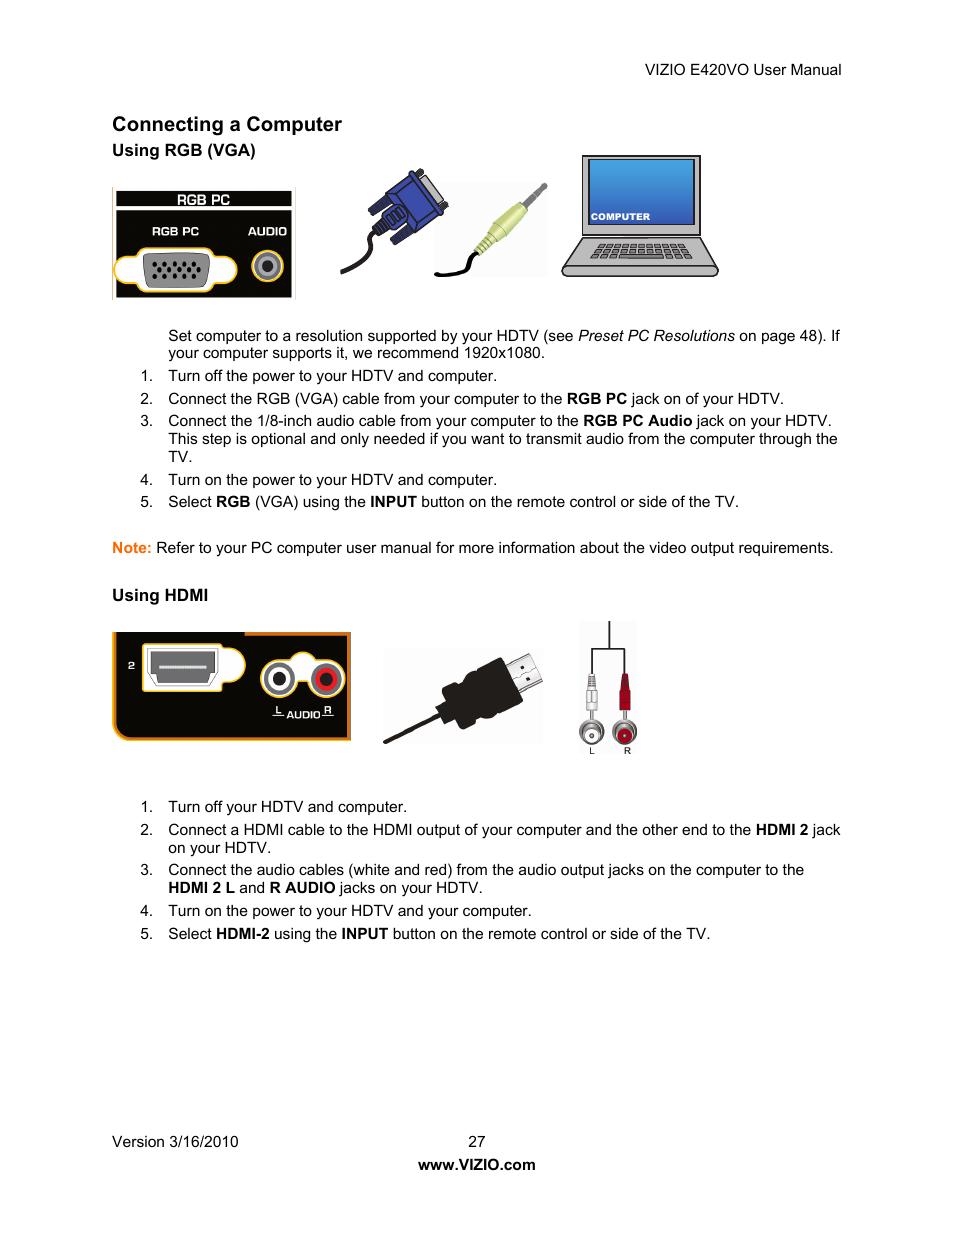 connecting a computer vizio e420vo user manual page 27 52 rh manualsdir com Vizio E420 Vizio E420VO Server